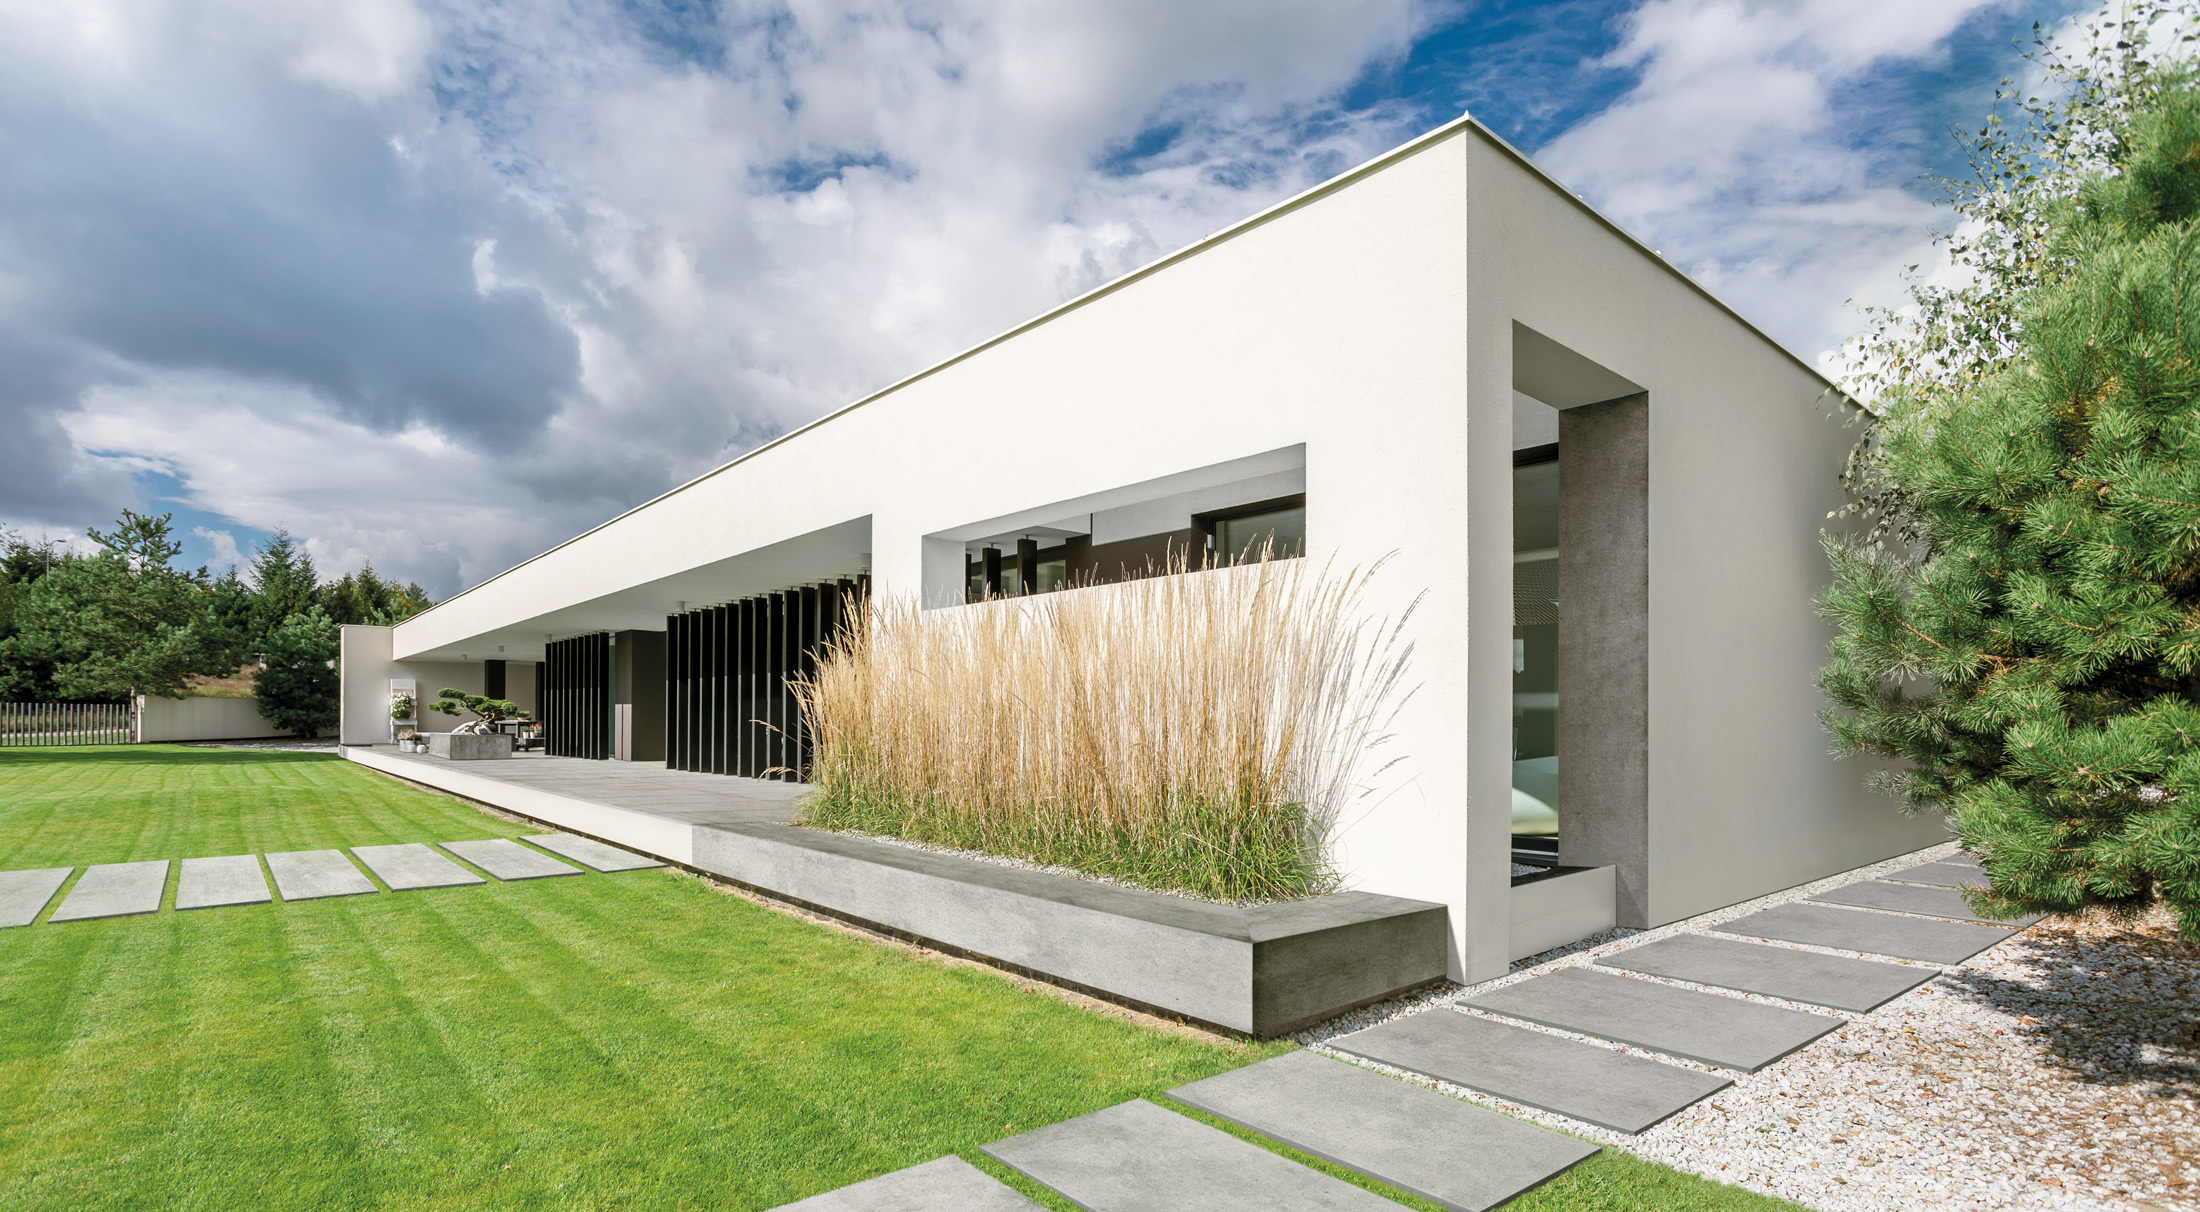 porcelain tile images: Projetto range high quality photo